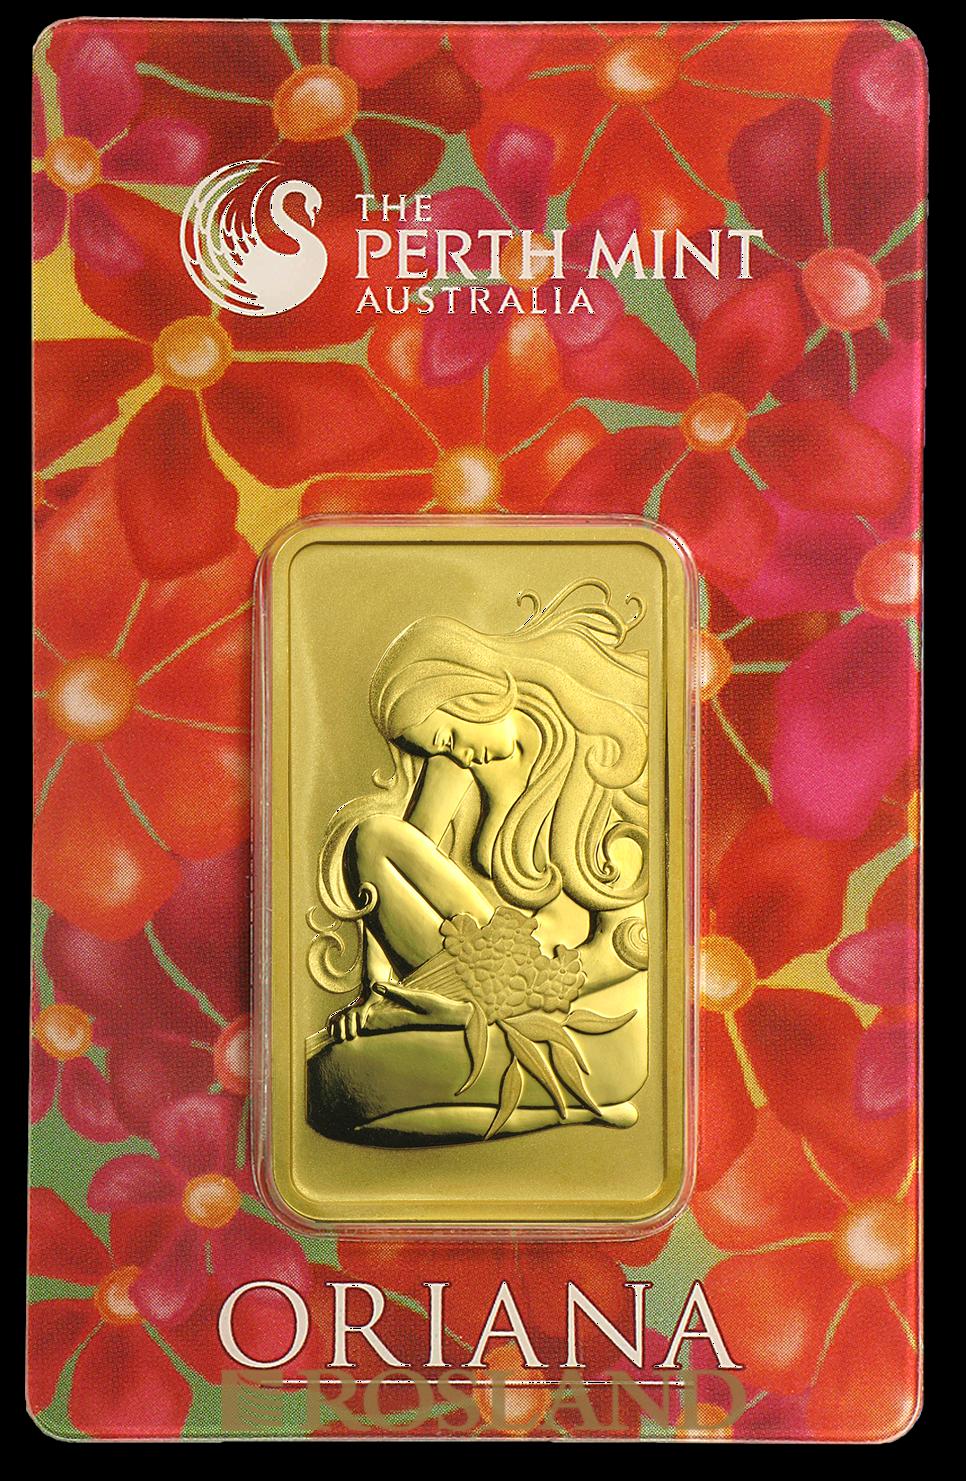 1 Unze Goldbarren Perth Mint Oriana